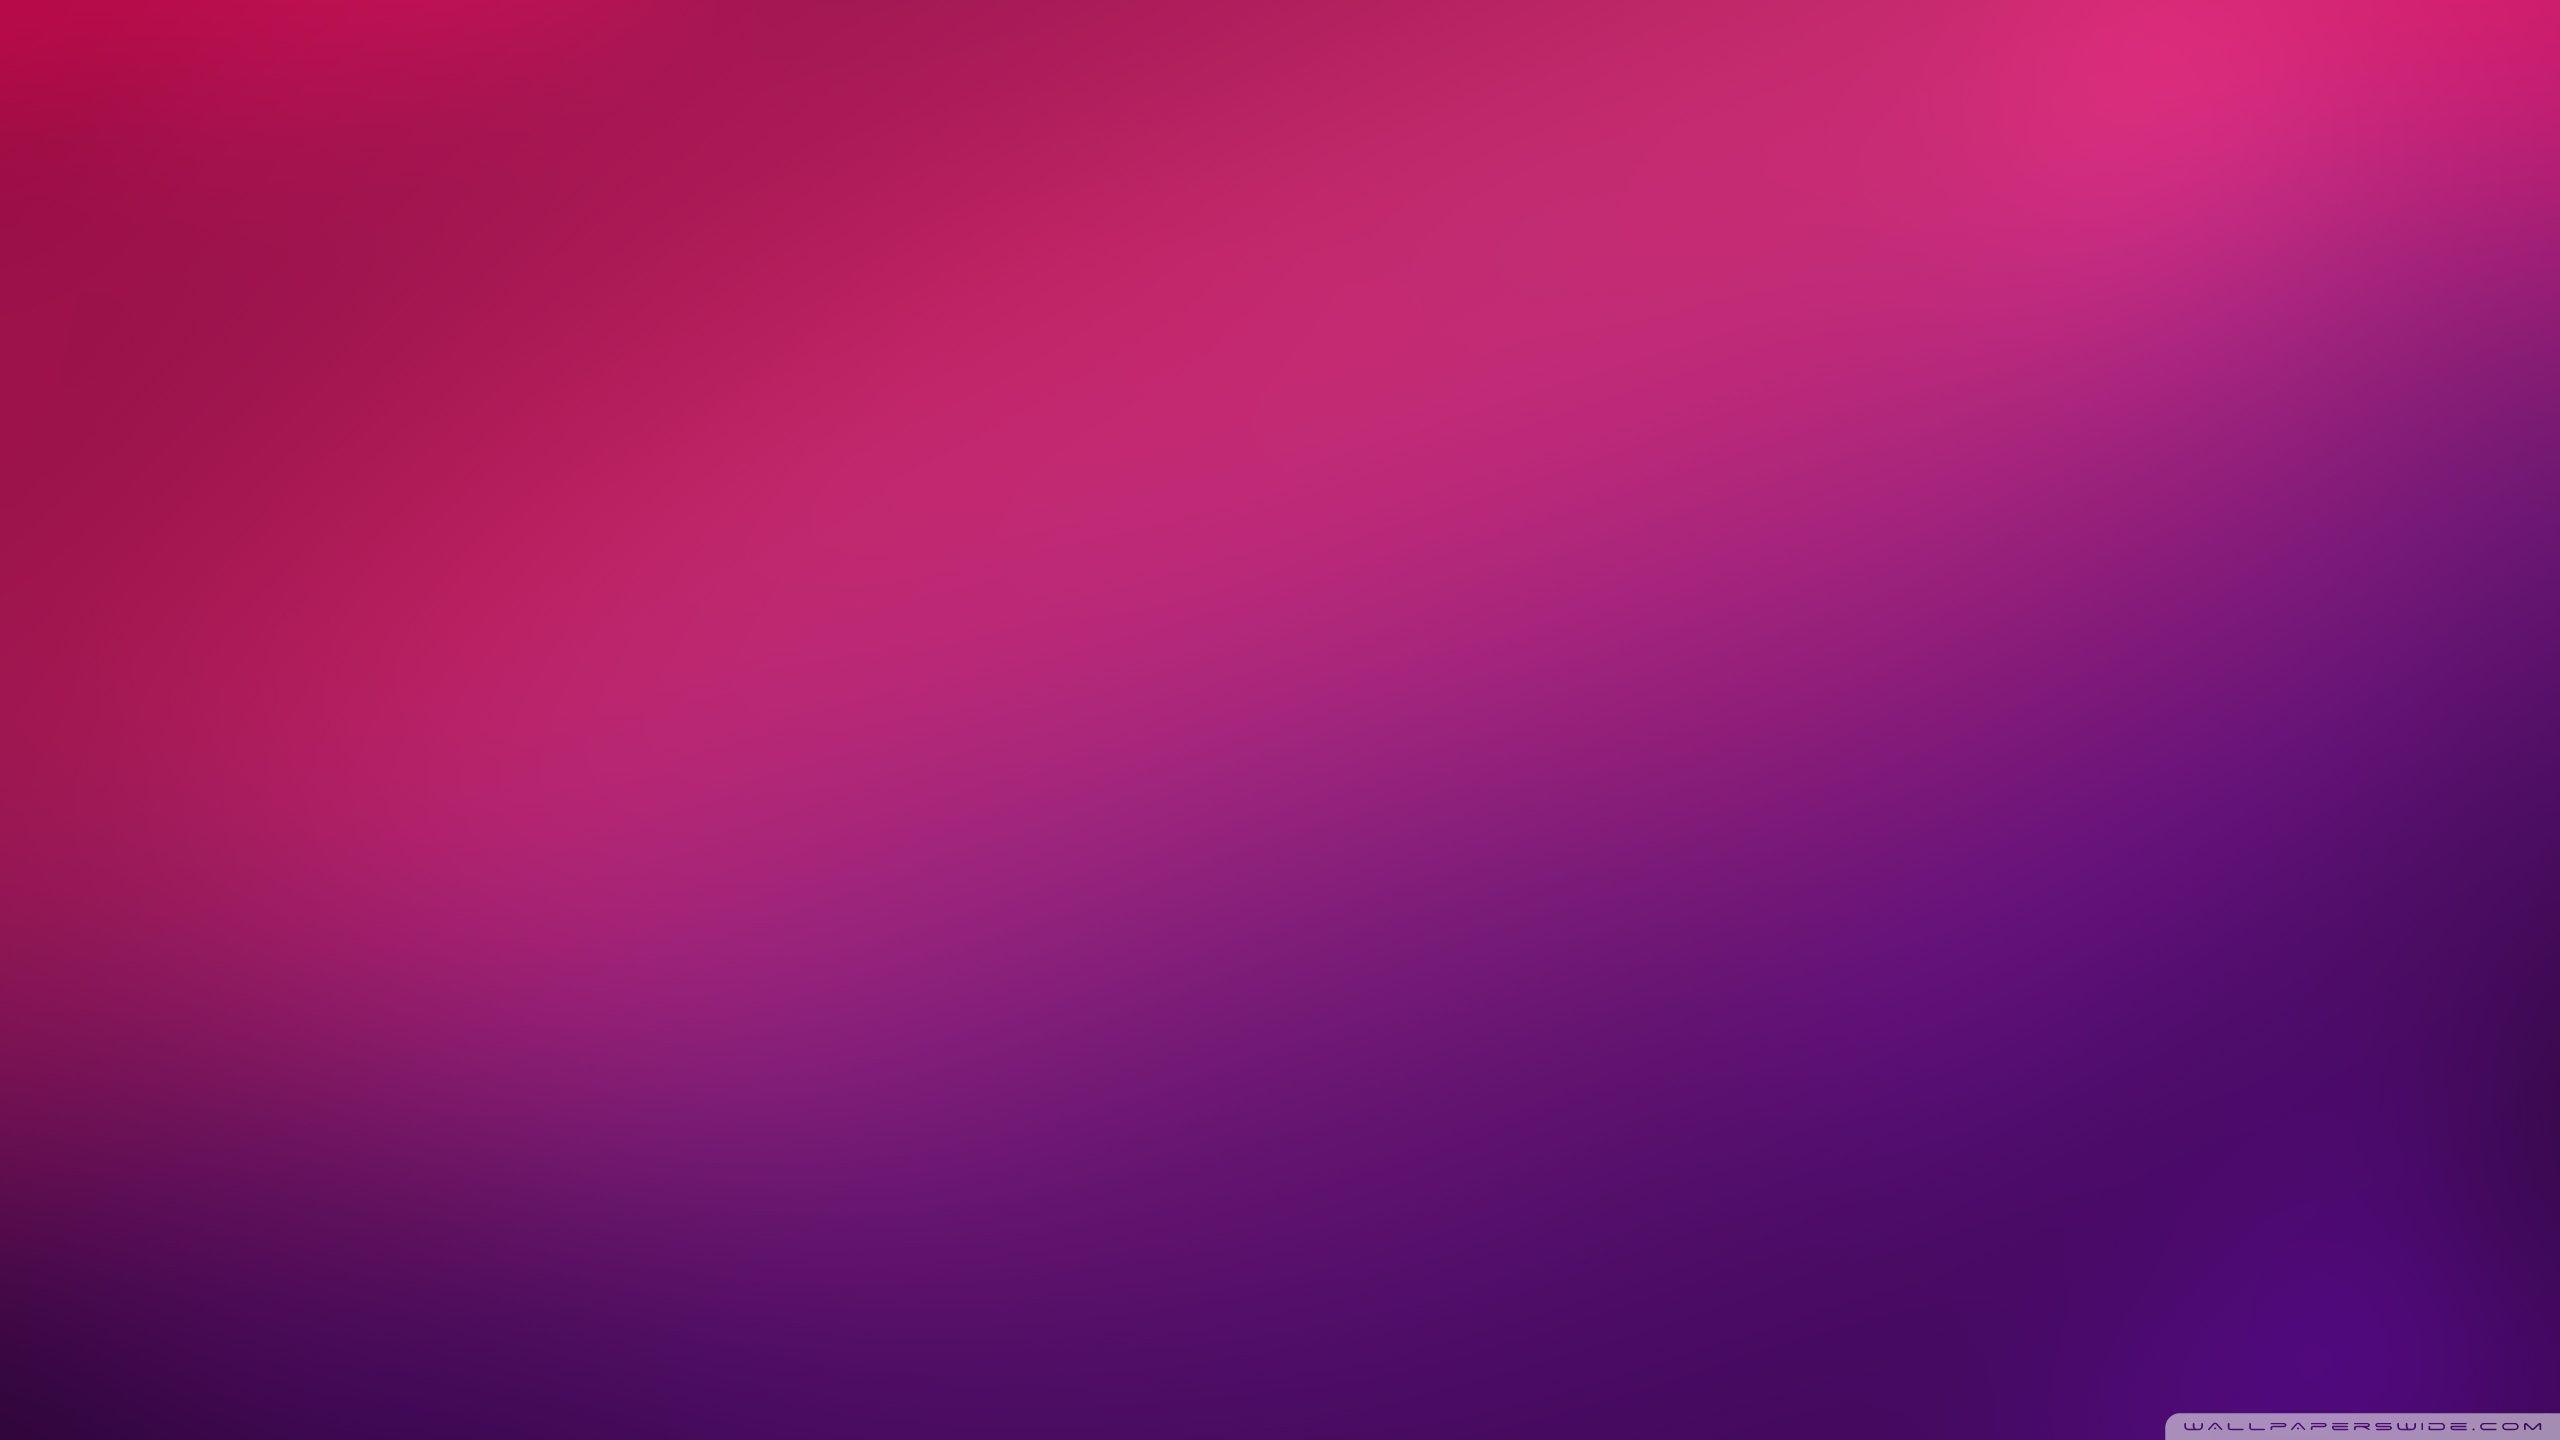 2560x1440 Minimalist Purple A 4k Hd Desktop Wallpaper Purple Background Minimalist 2560x1440 Download Hd Wallpaper Wallpapertip